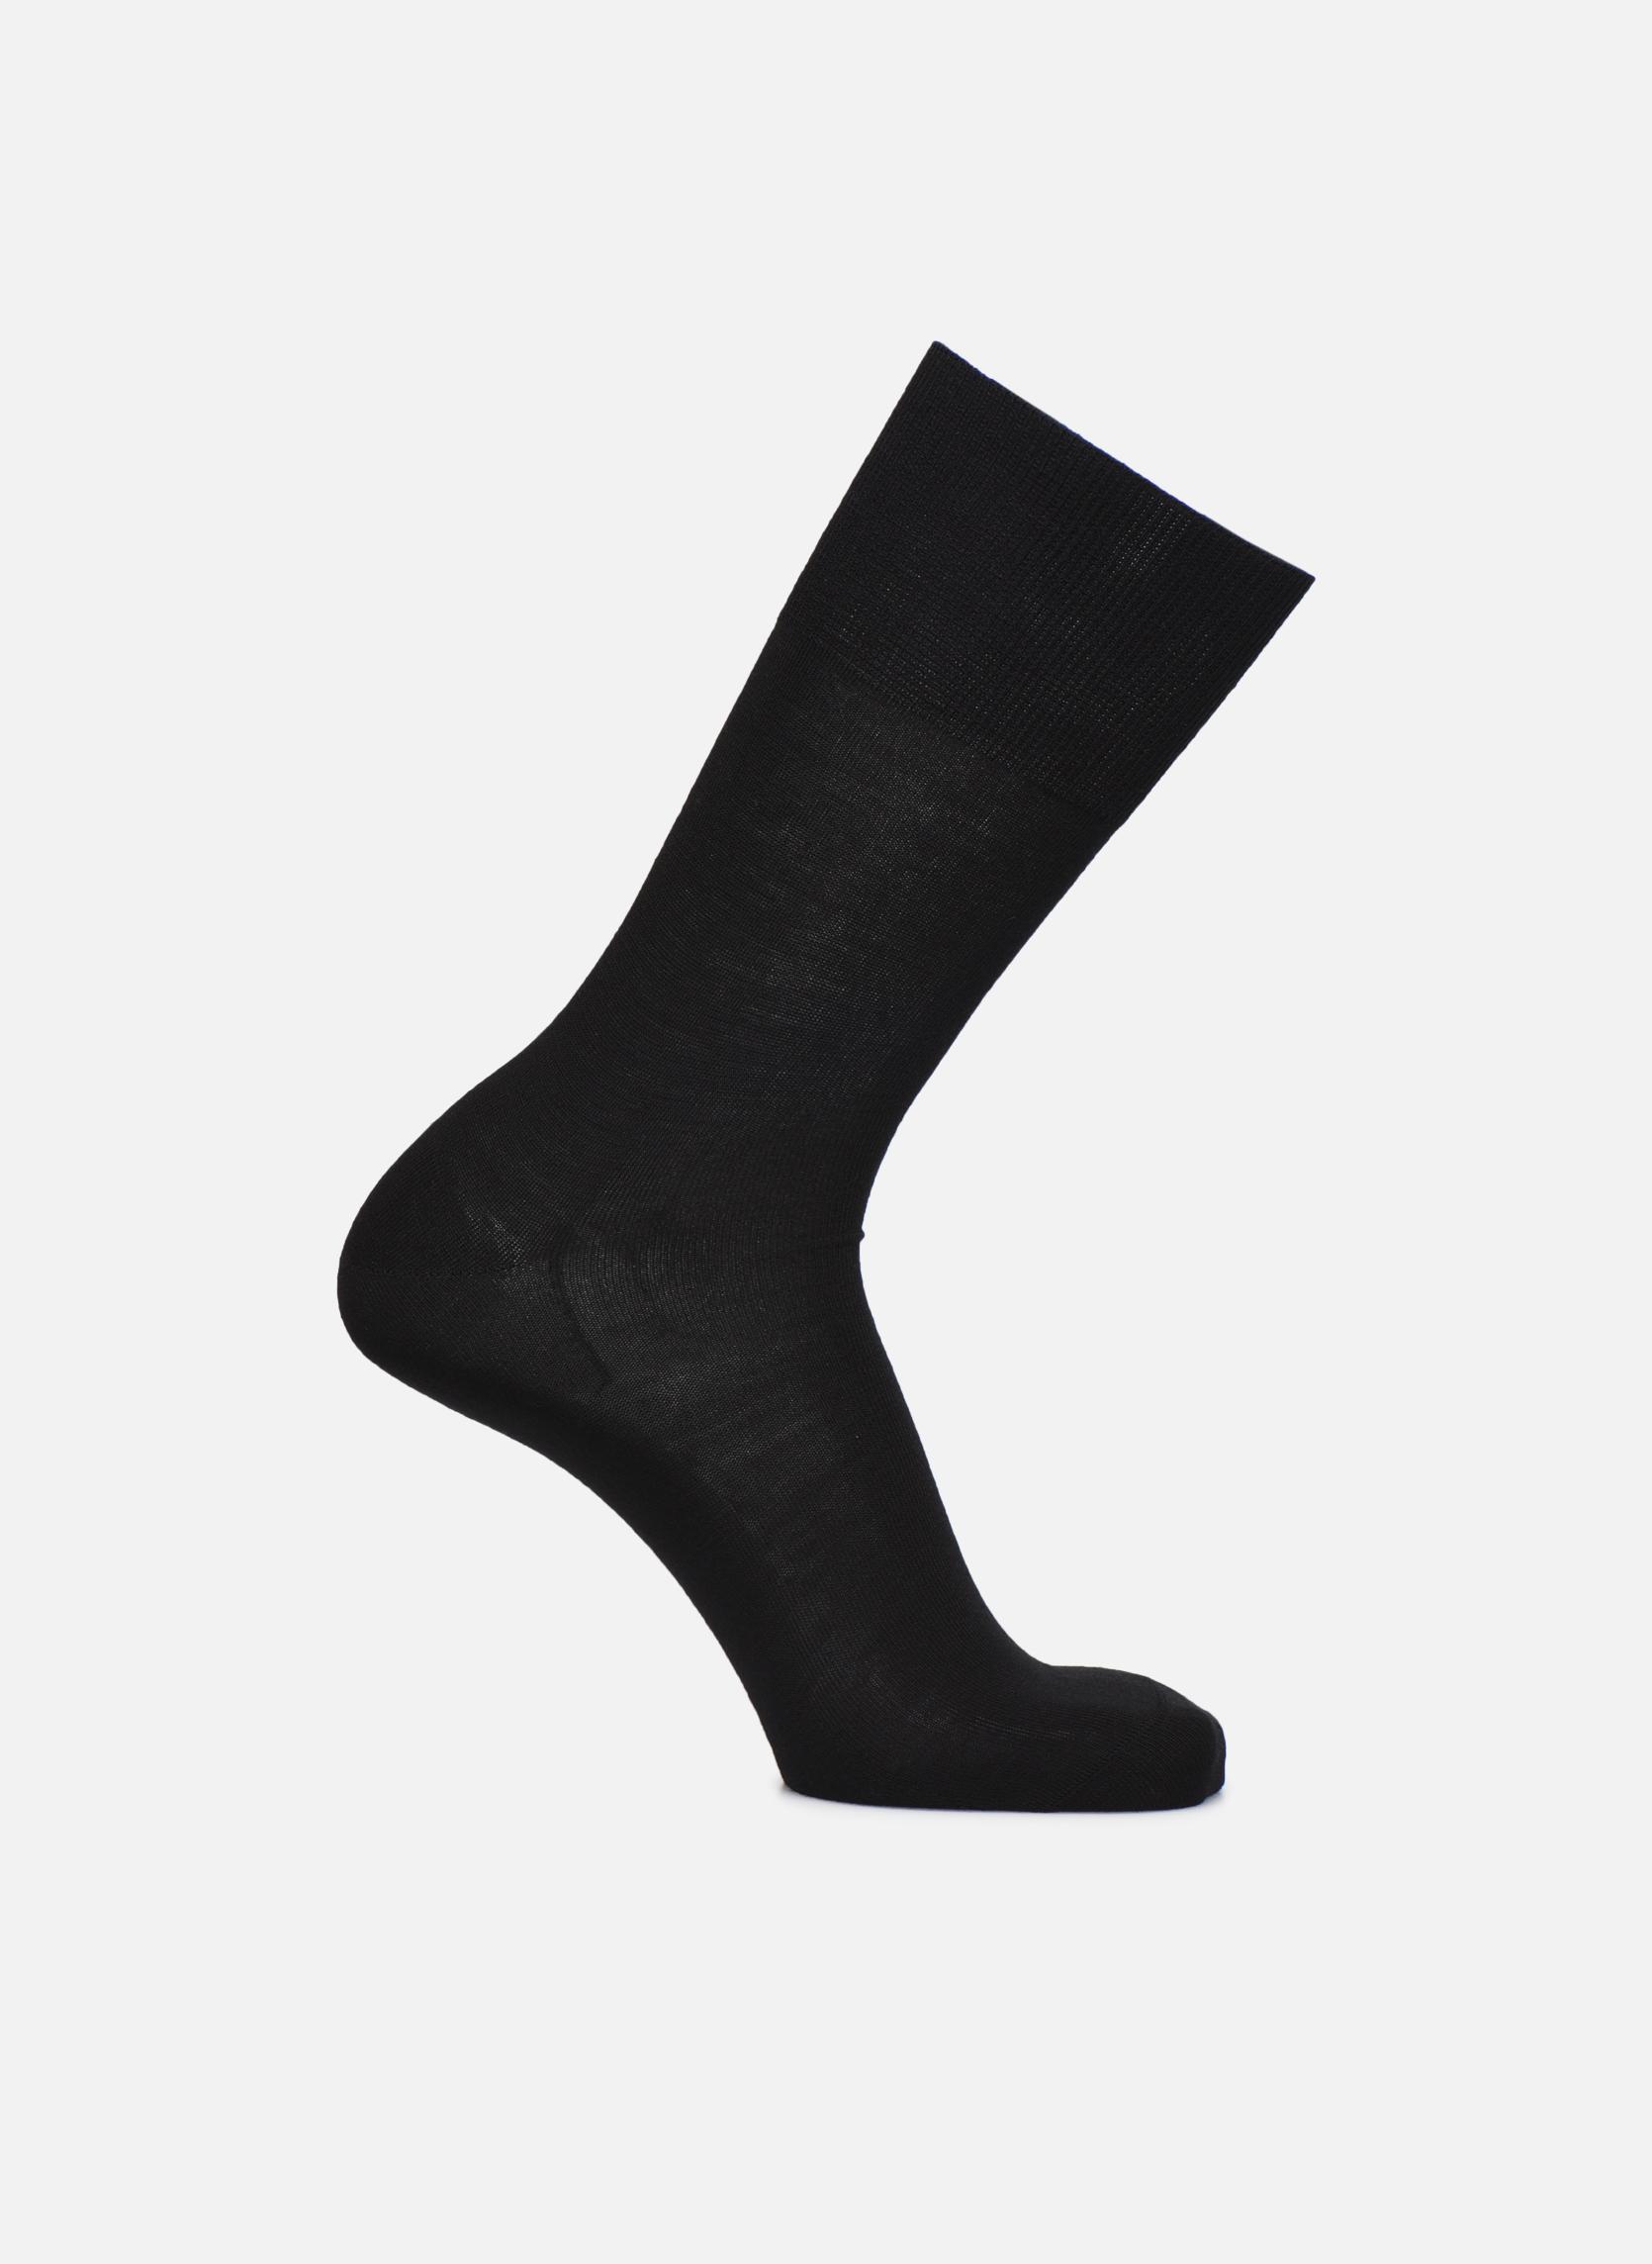 Socken AIRPORT 3000 noir